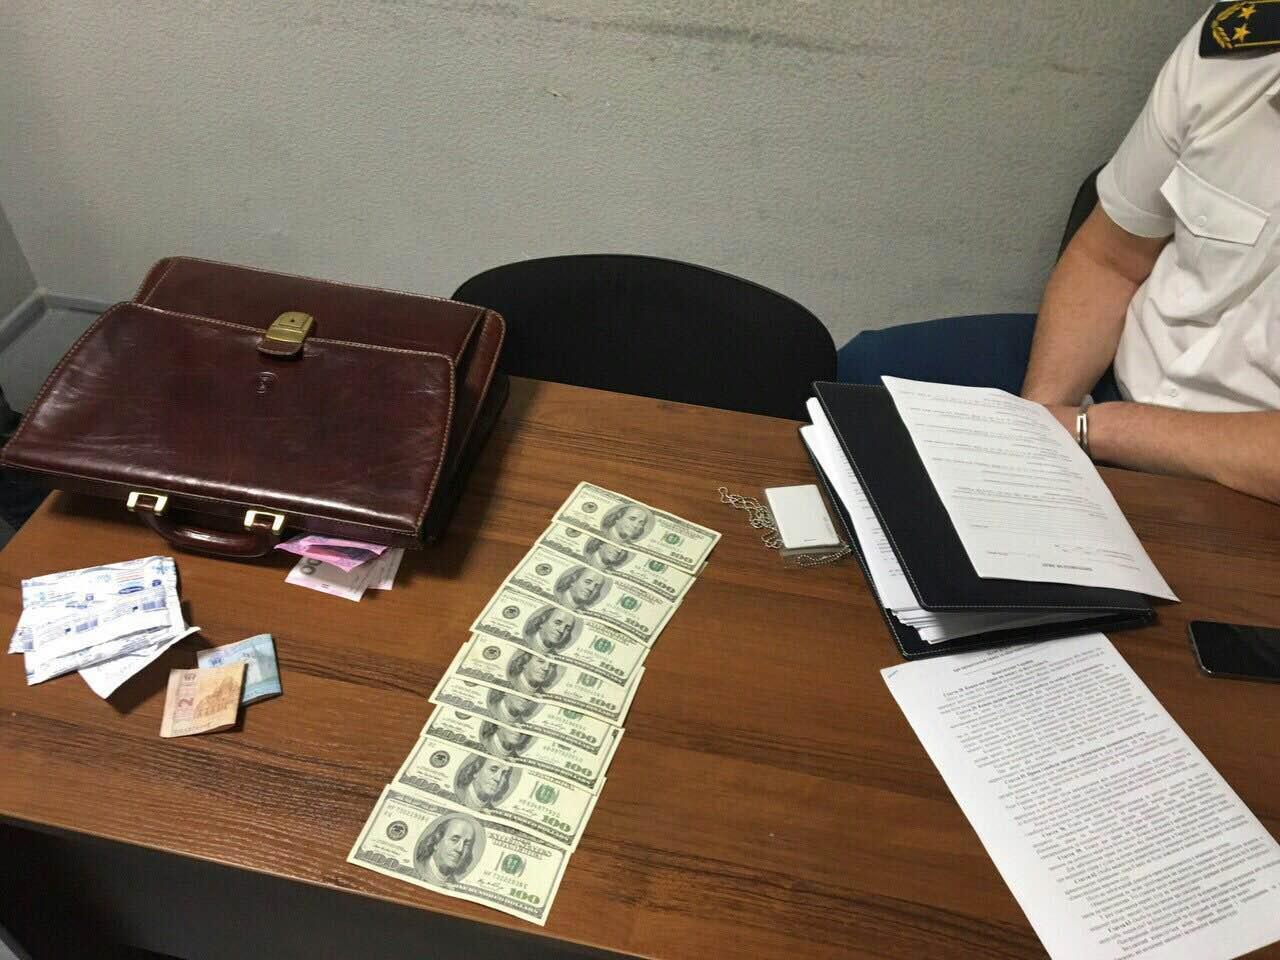 В аэропорту «Киев» на взятке поймали руководителя таможенного поста (ФОТО, ВИДЕО)